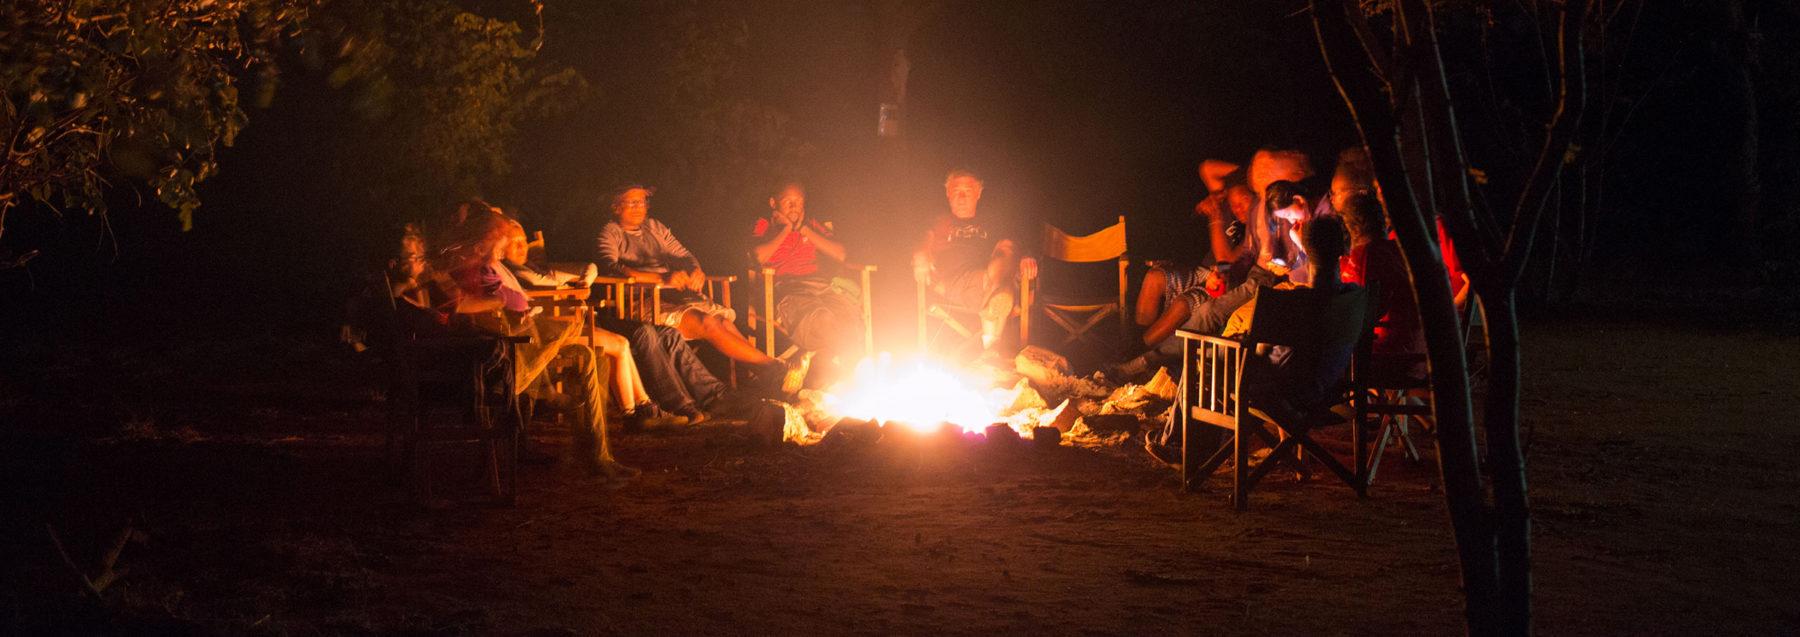 Gather around the campfire